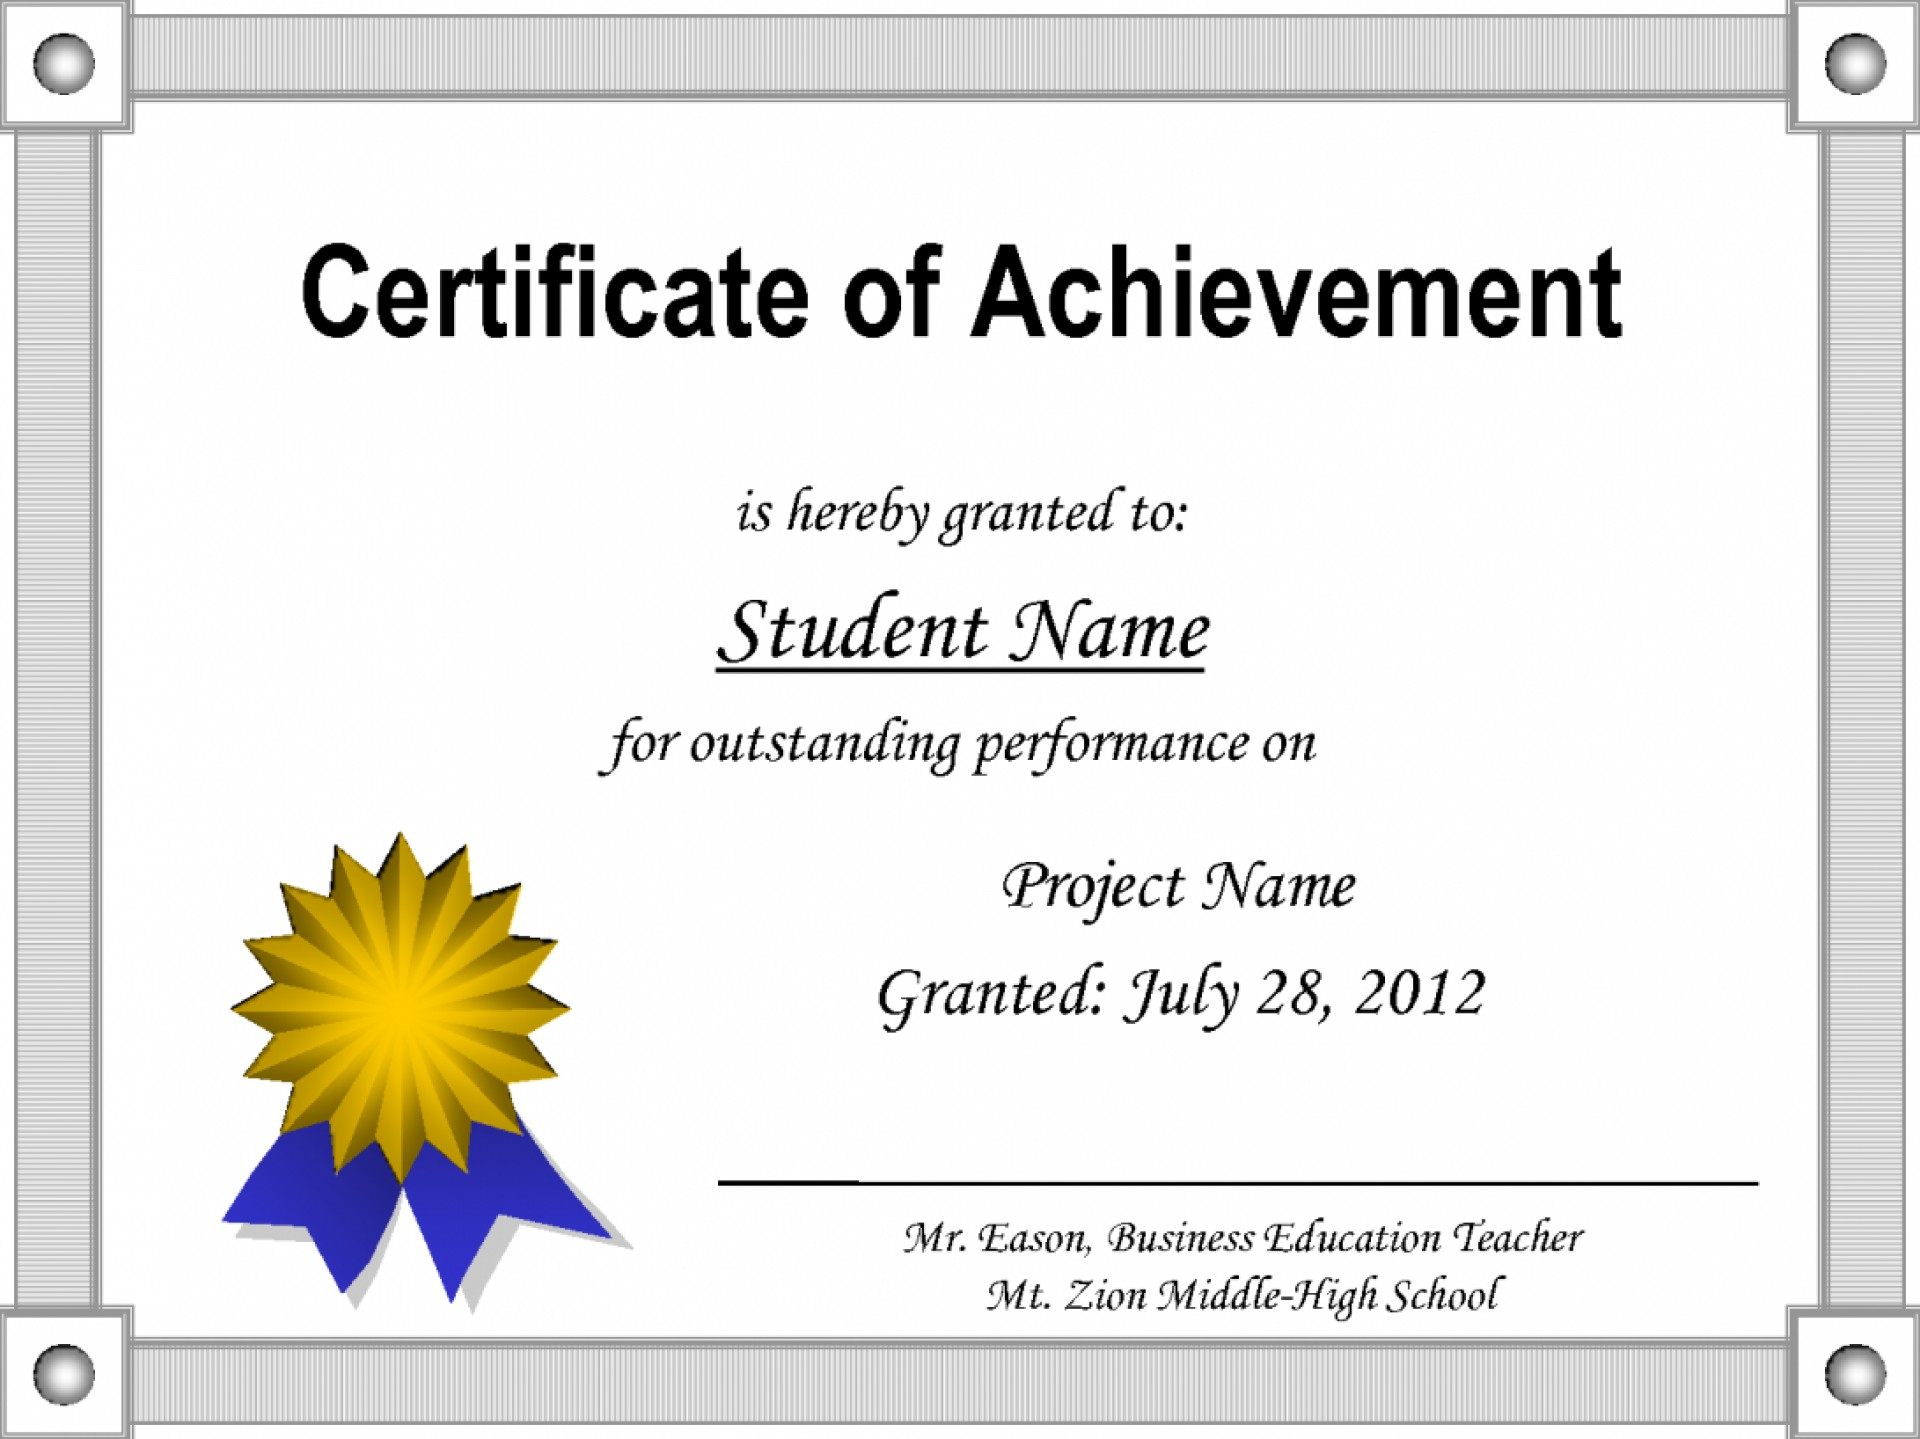 012 Template Ideas Certificate Award Microsoft Awesome Word Regarding Congratulations Certificate Word Template